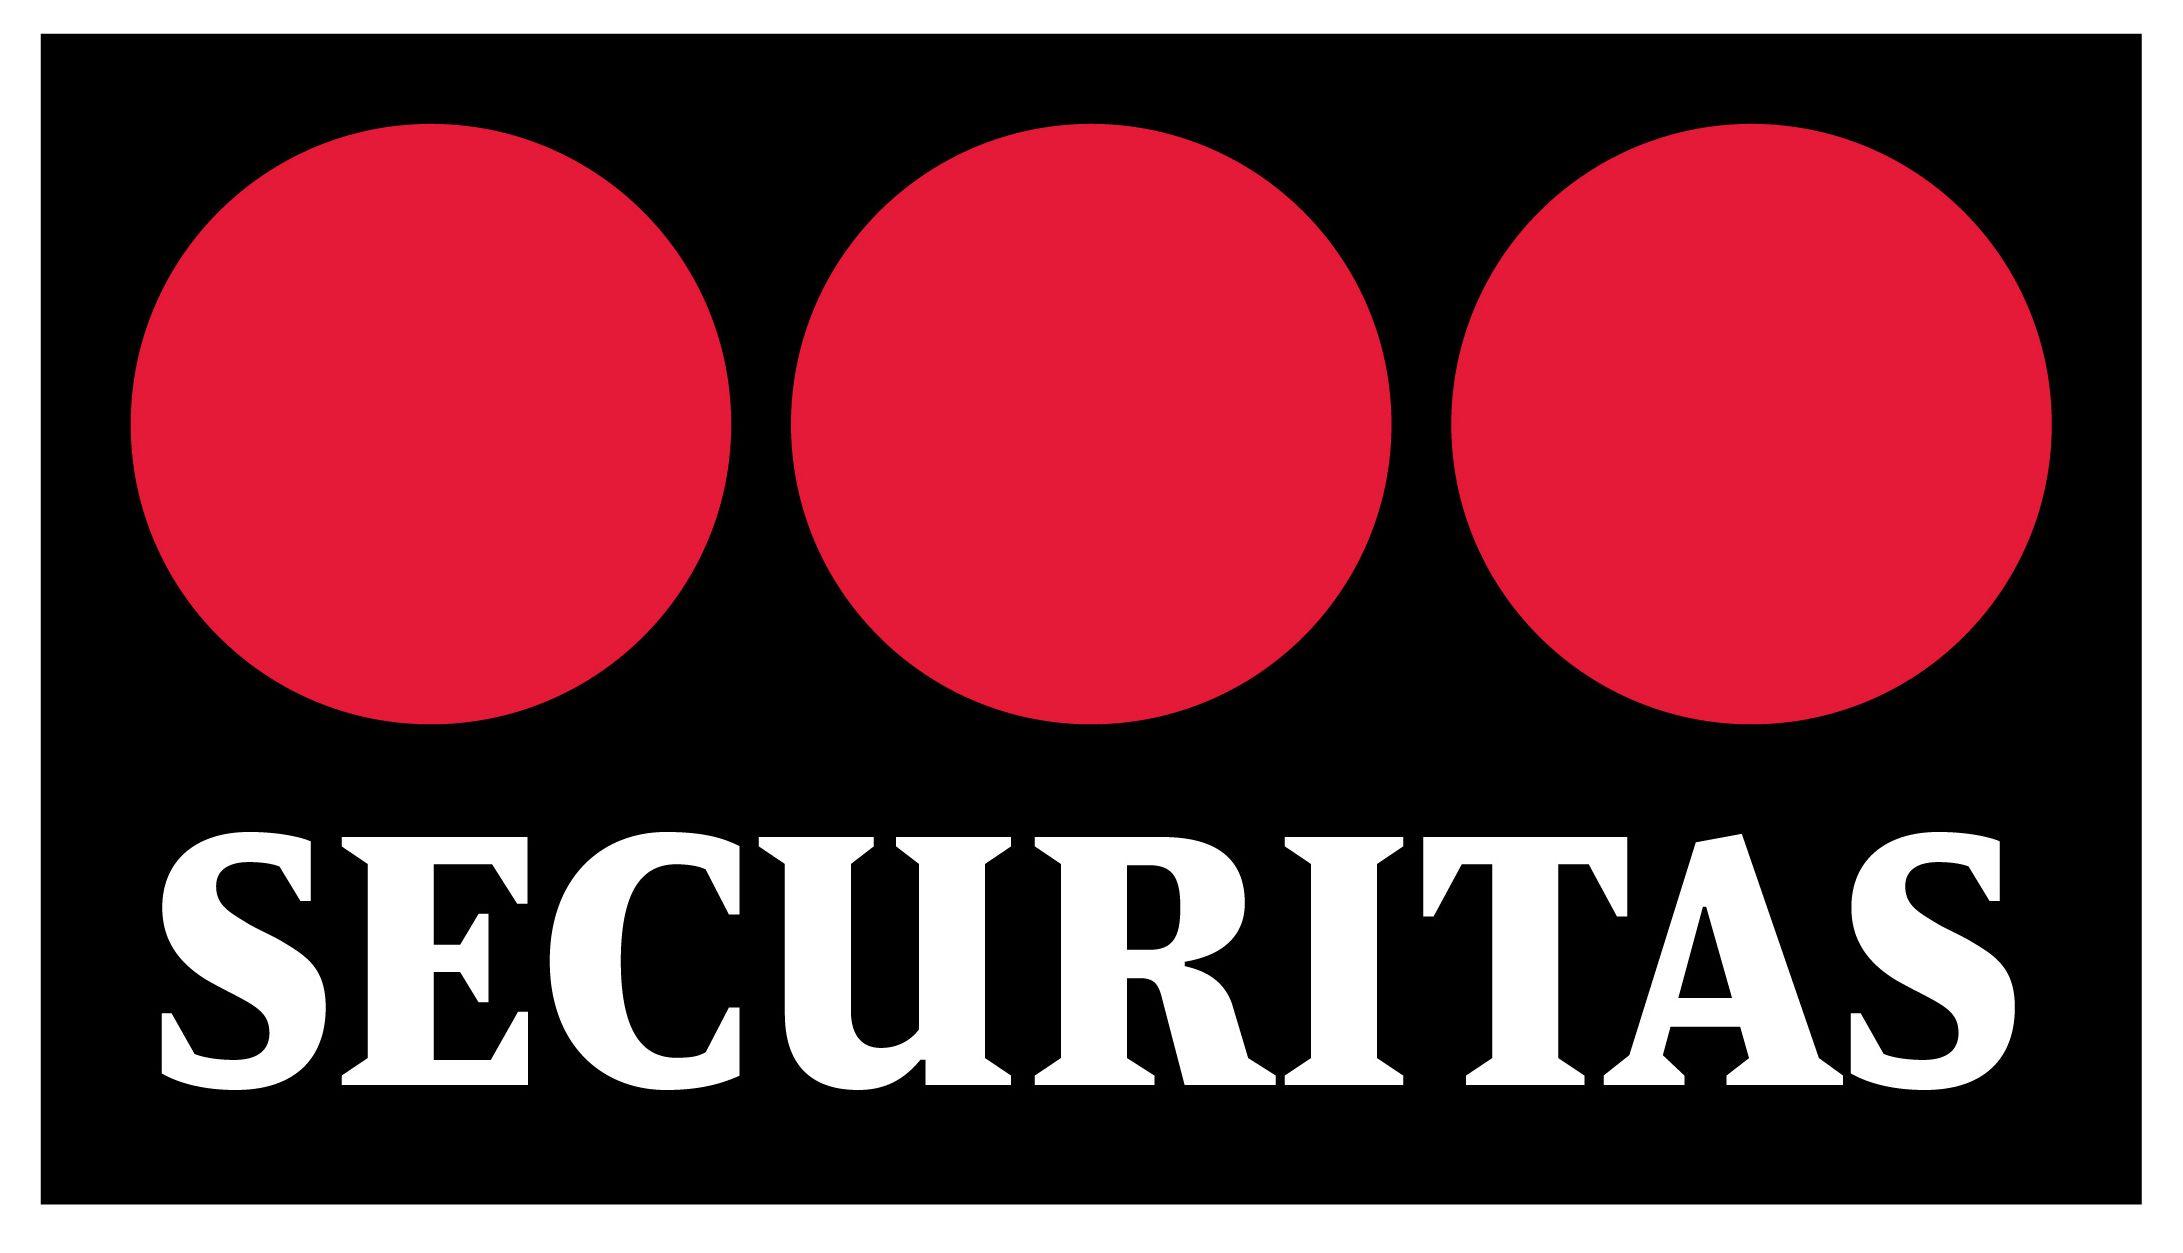 Securitas Logo Voor Nieuwsitem Securitas Jpg 2183 1253 Credit